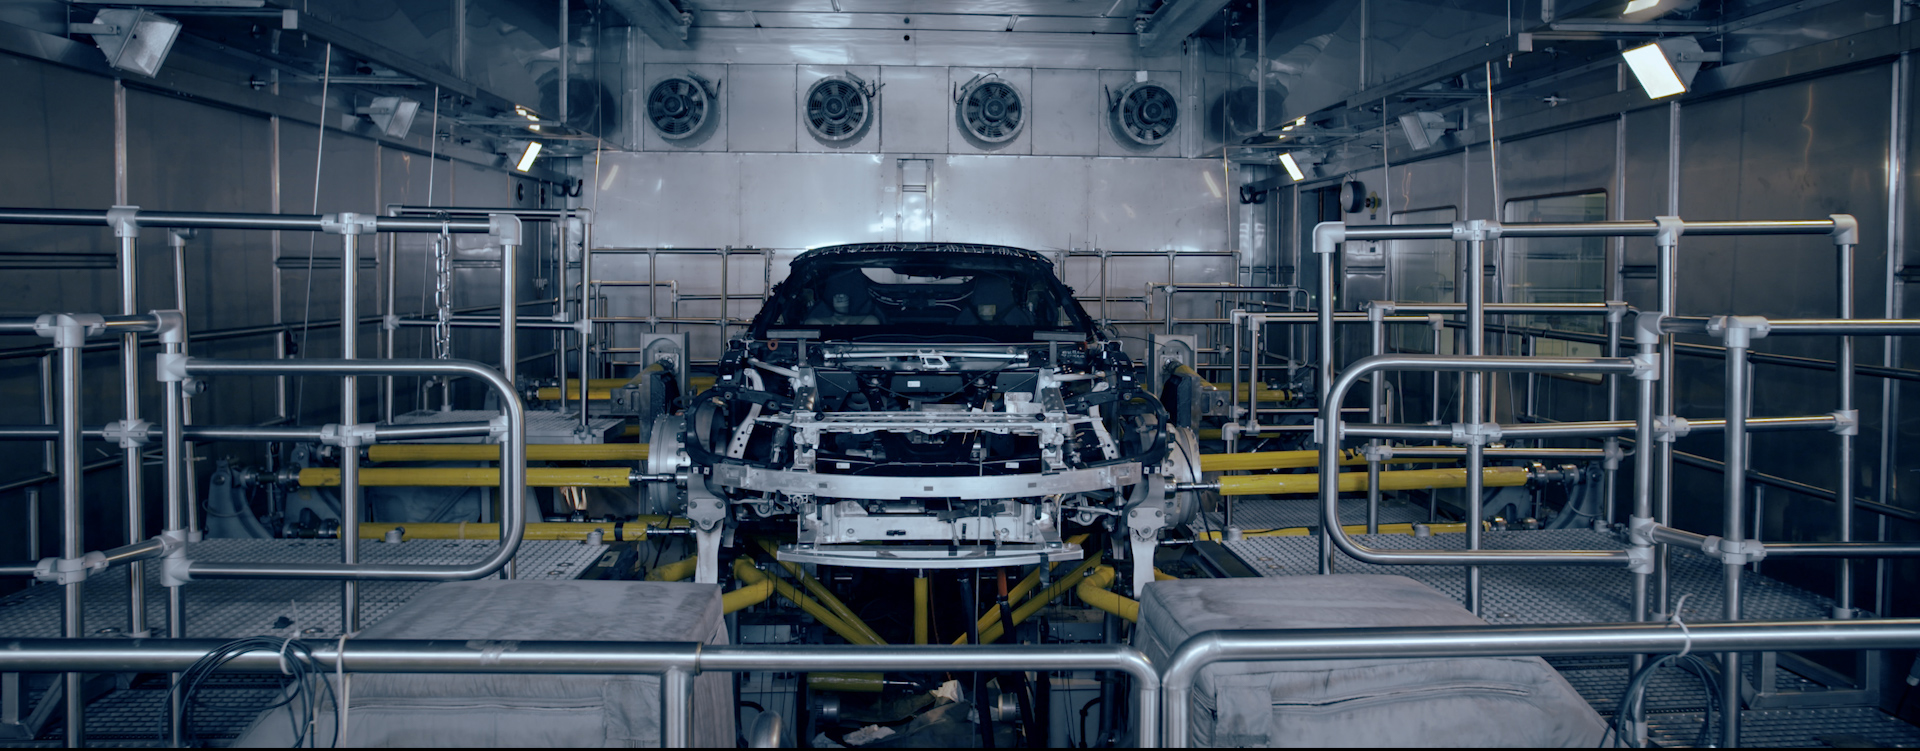 TrackWorthy - BMW i8 Roadster